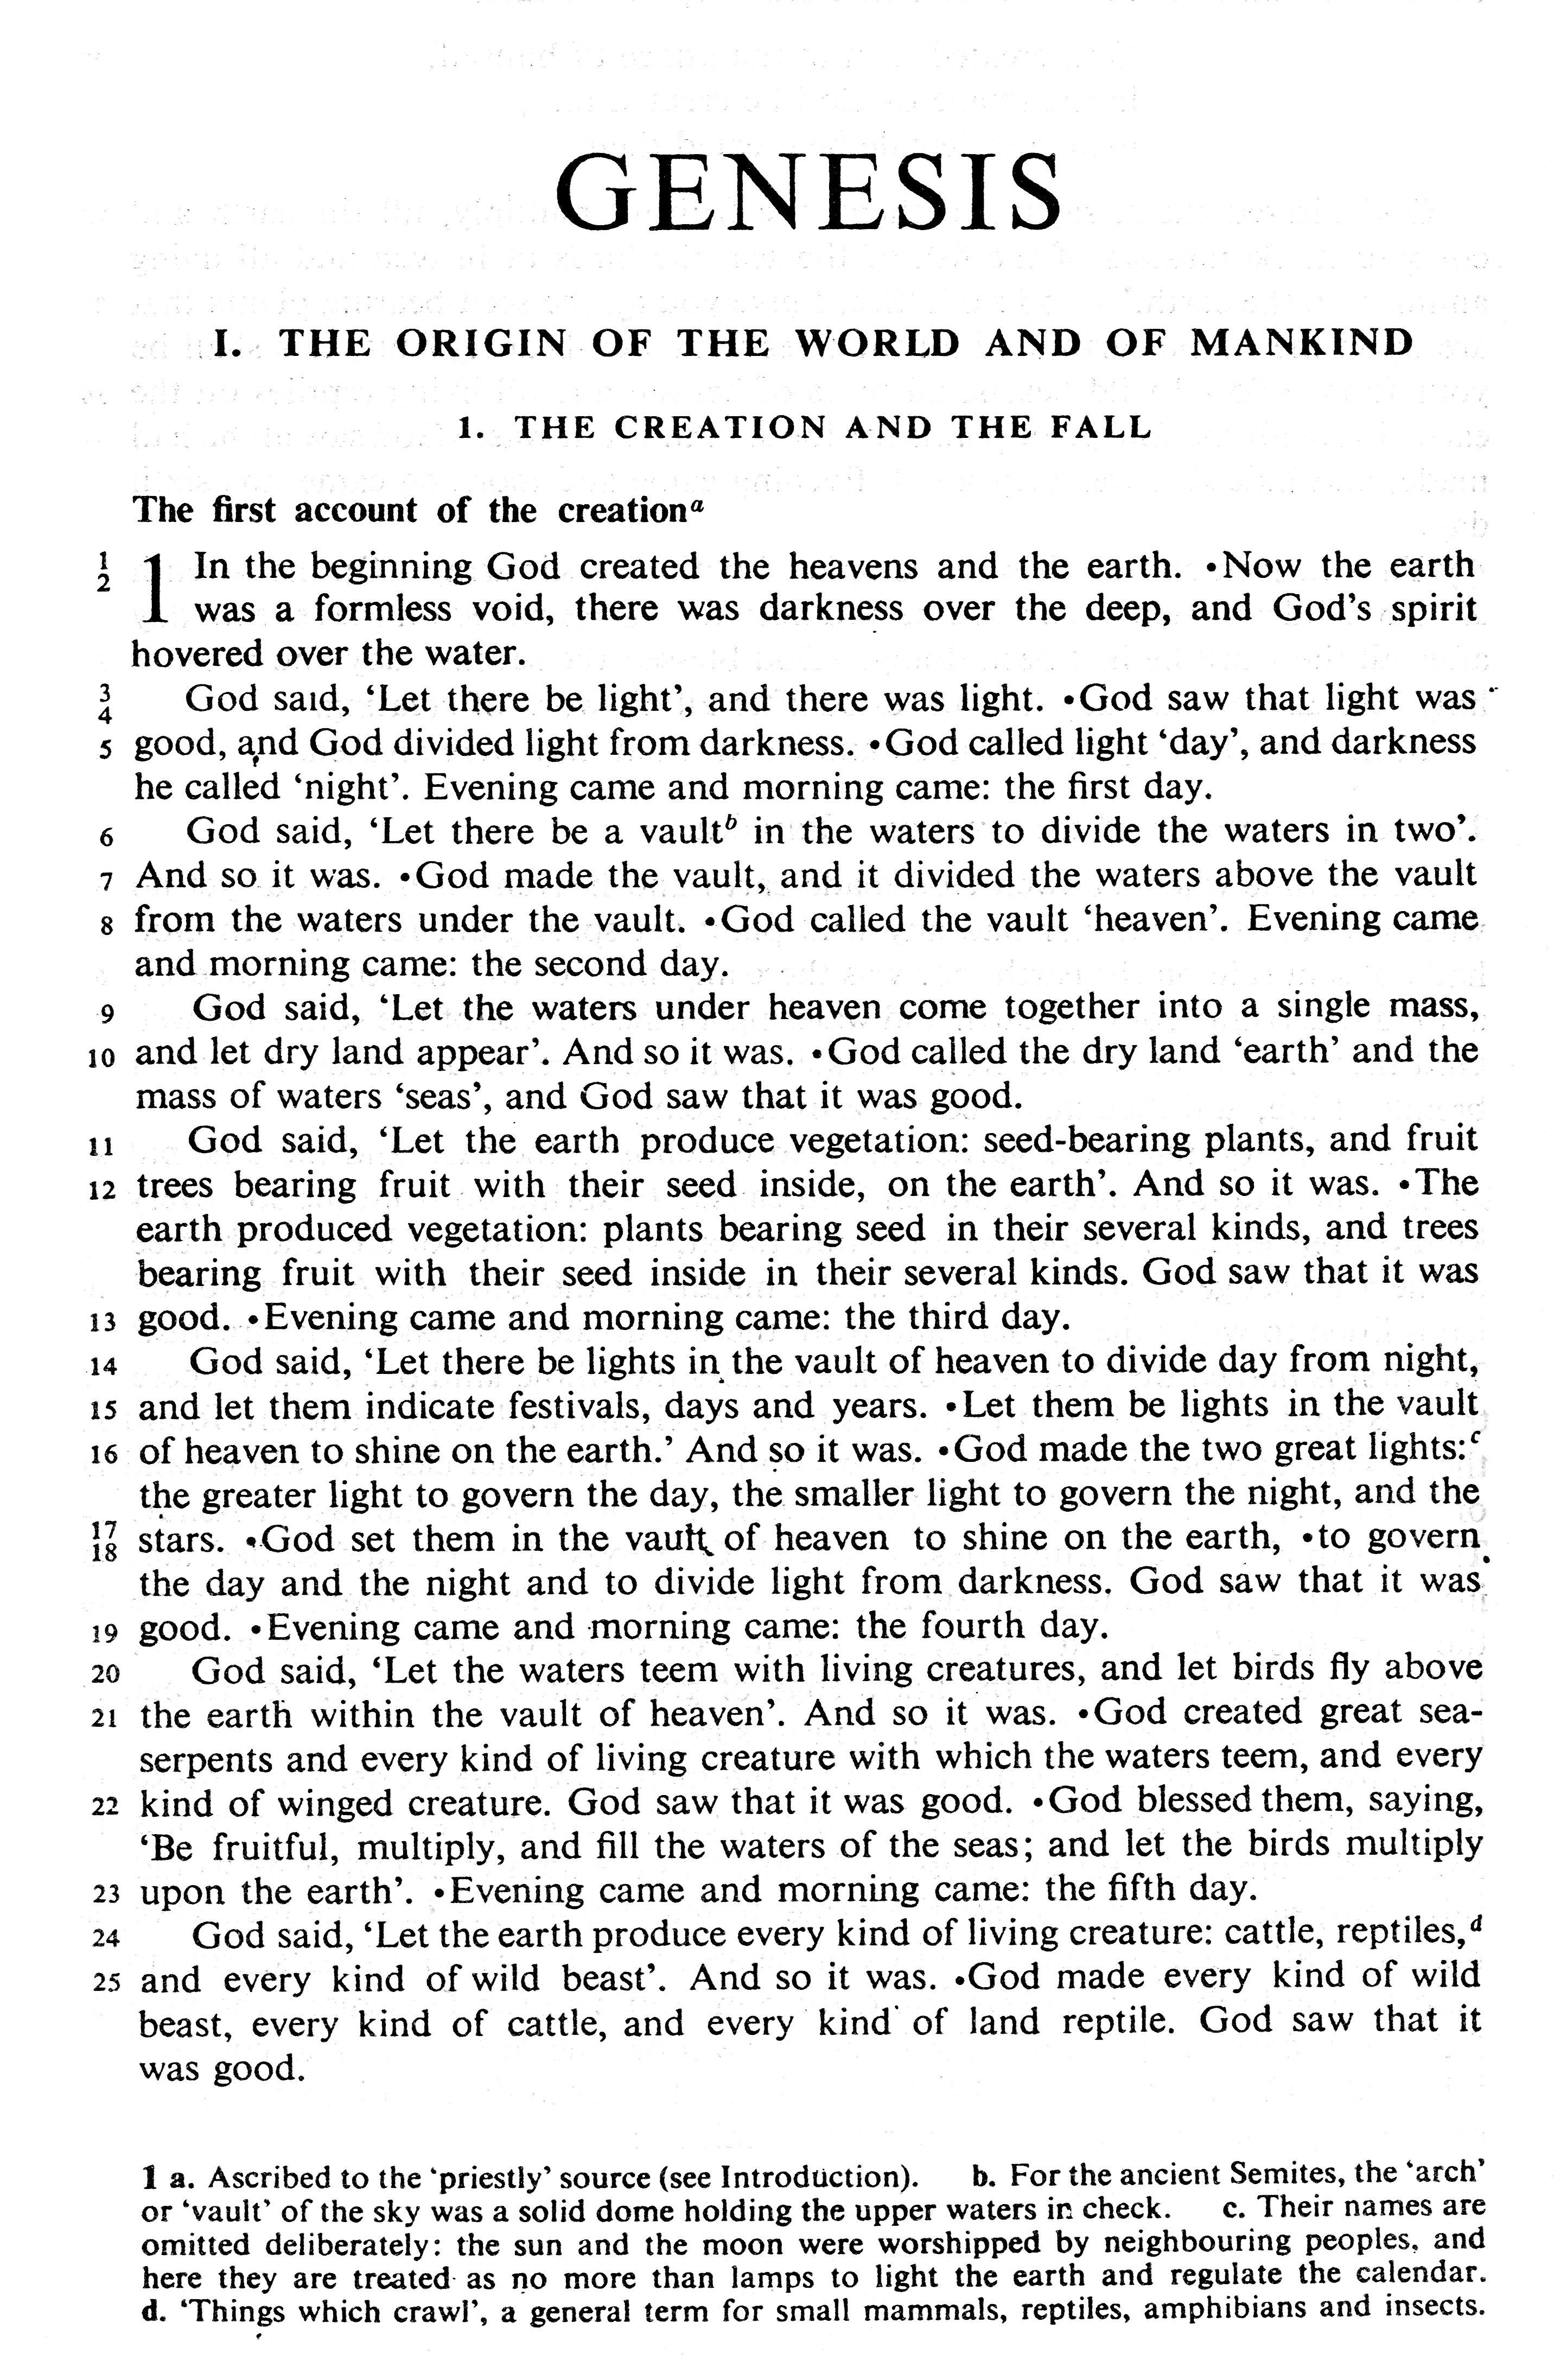 Jerusalem Bible, Popular Edition , (1966) p.5 Genesis 1